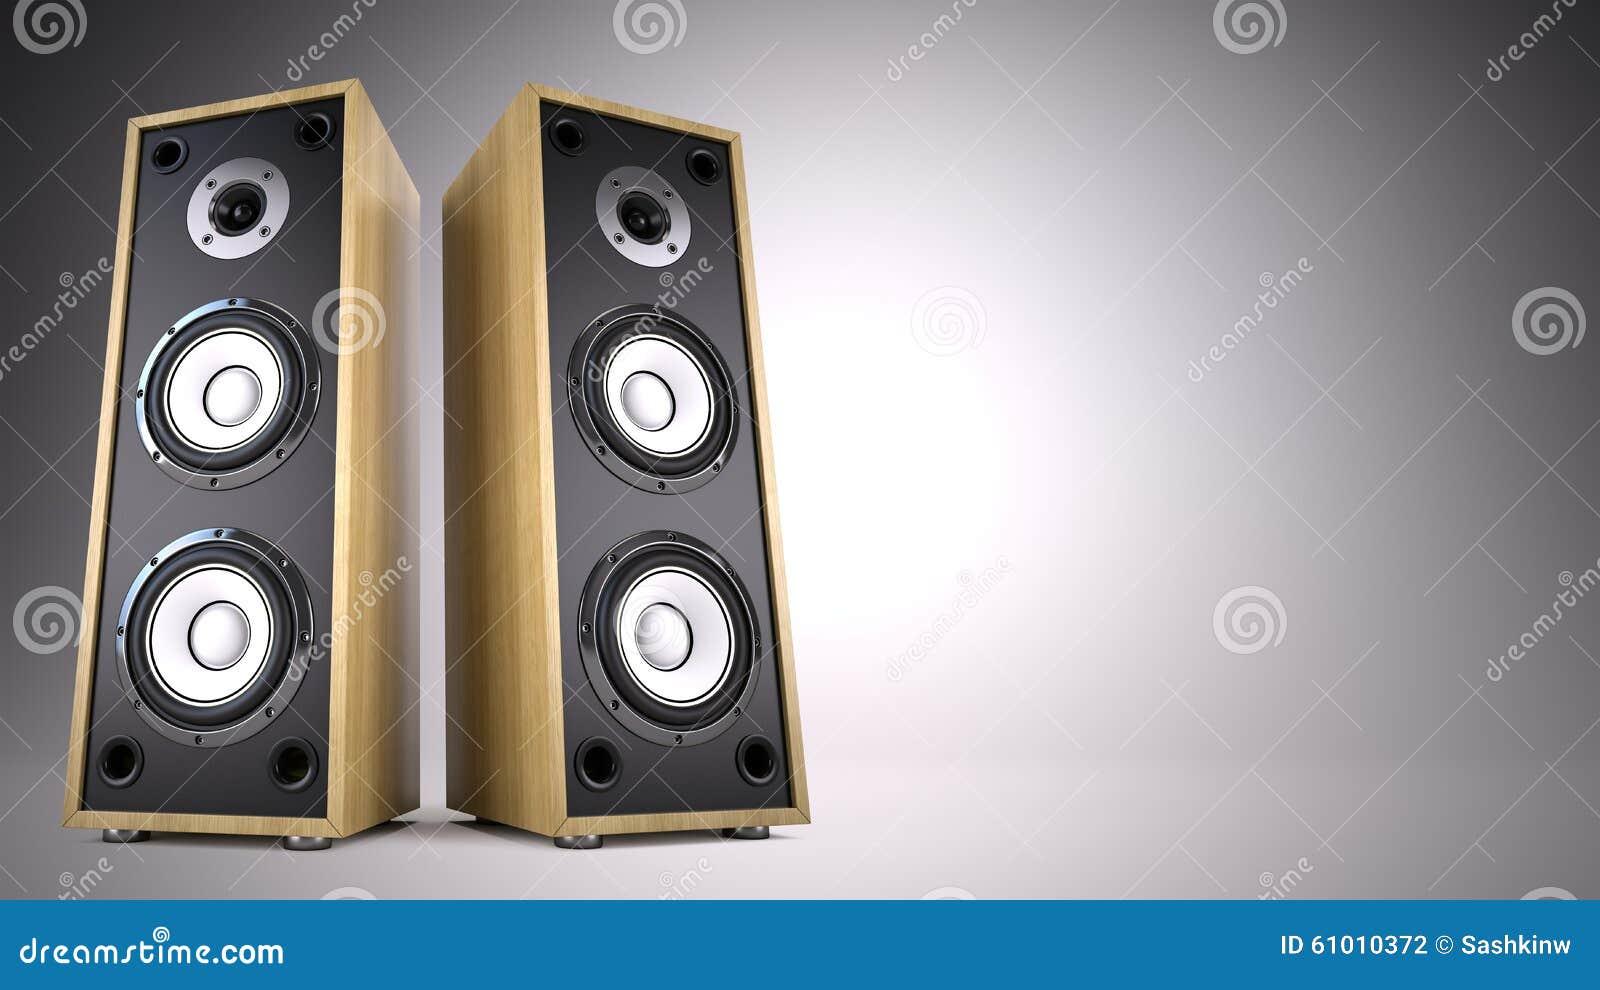 Advertisement, Music, Concert, Audio Concept Stock Illustration